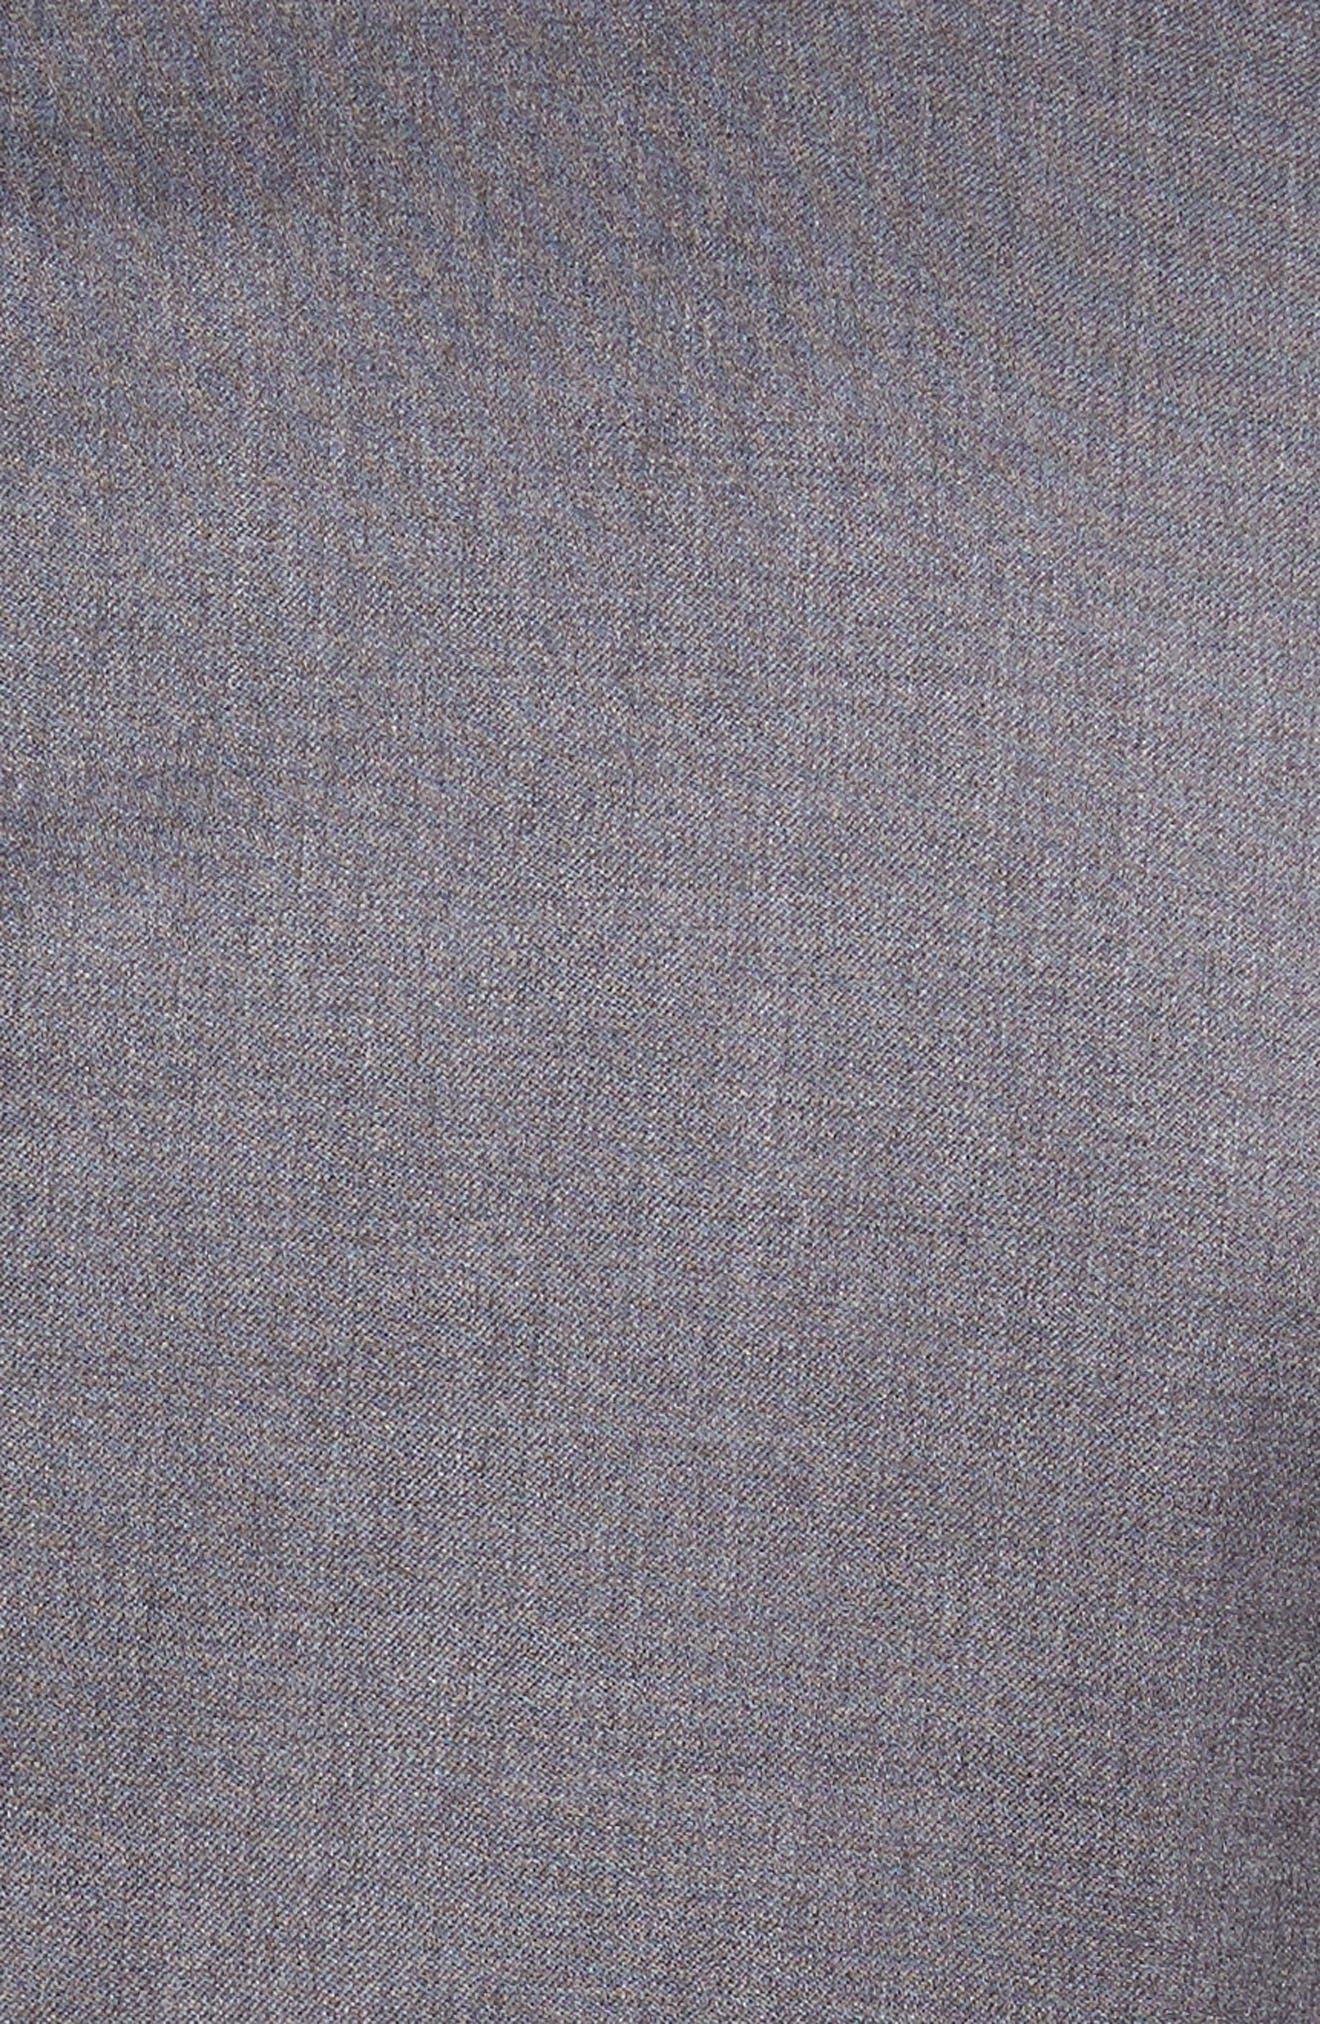 Ryan/Win Trim Fit Solid Wool Suit,                             Alternate thumbnail 7, color,                             Medium Grey